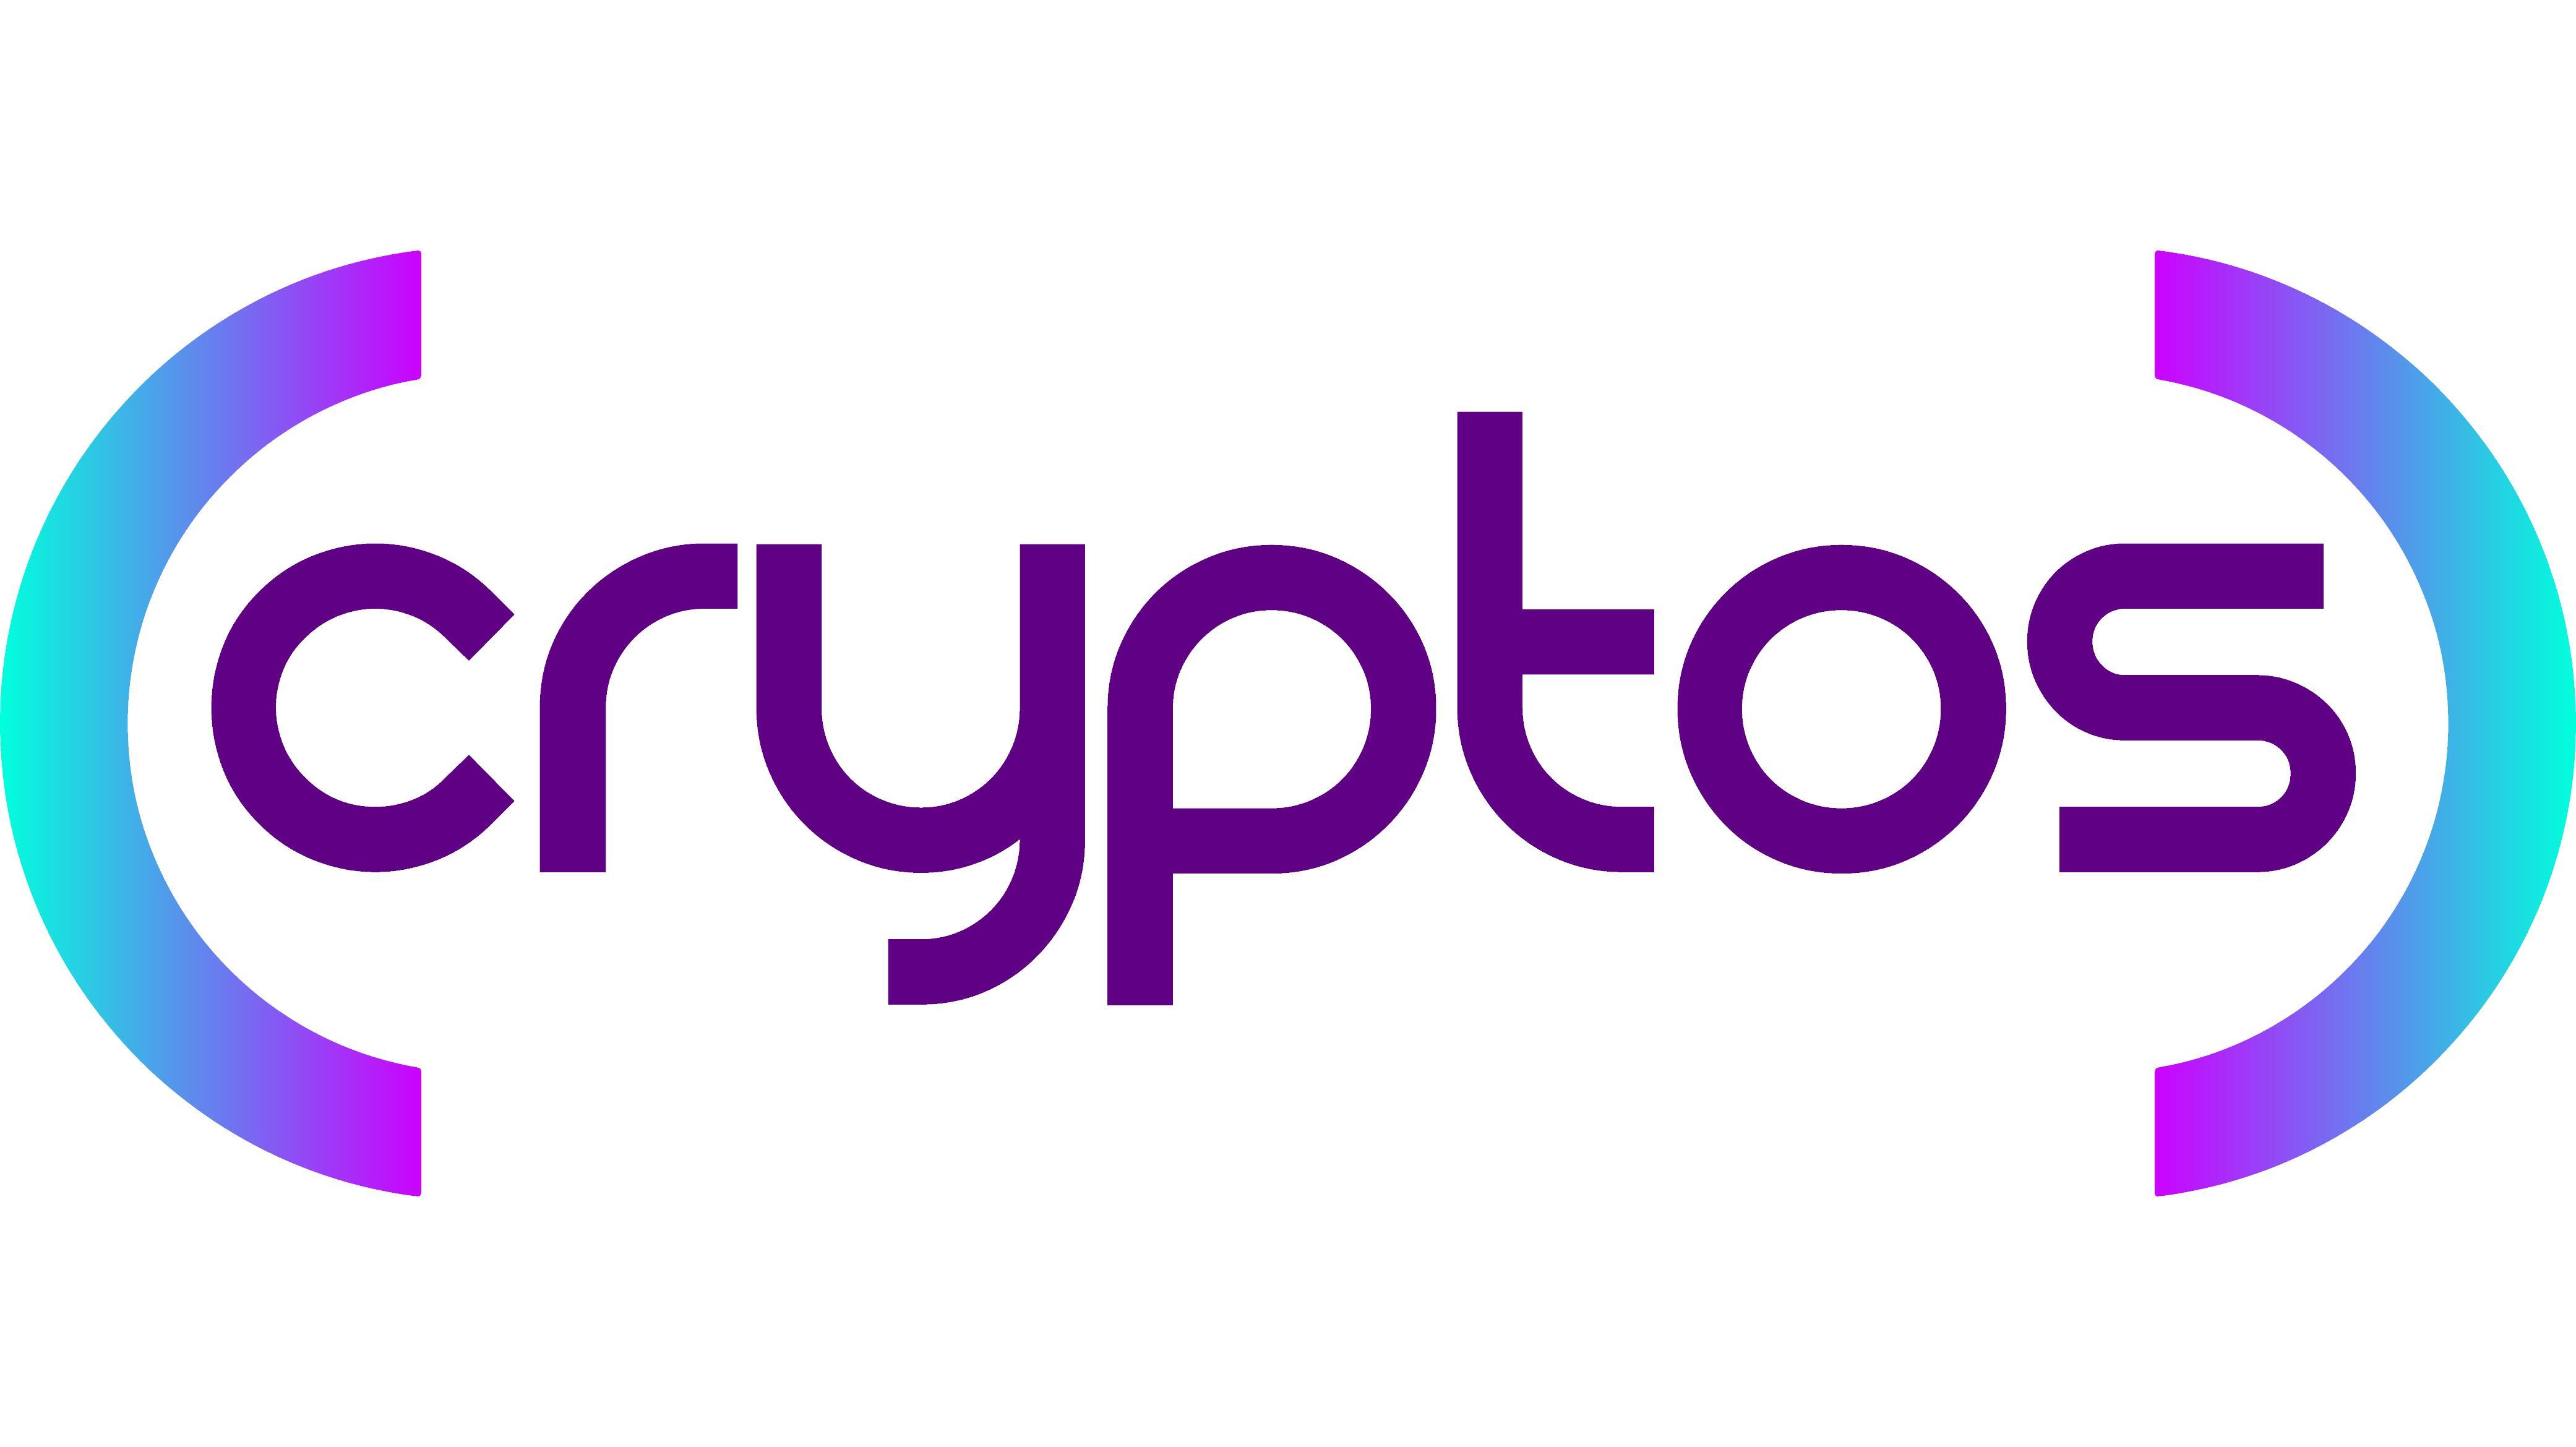 FirstShotCenters,LLCtokensaretradingonSTOCryptocurrency Platform